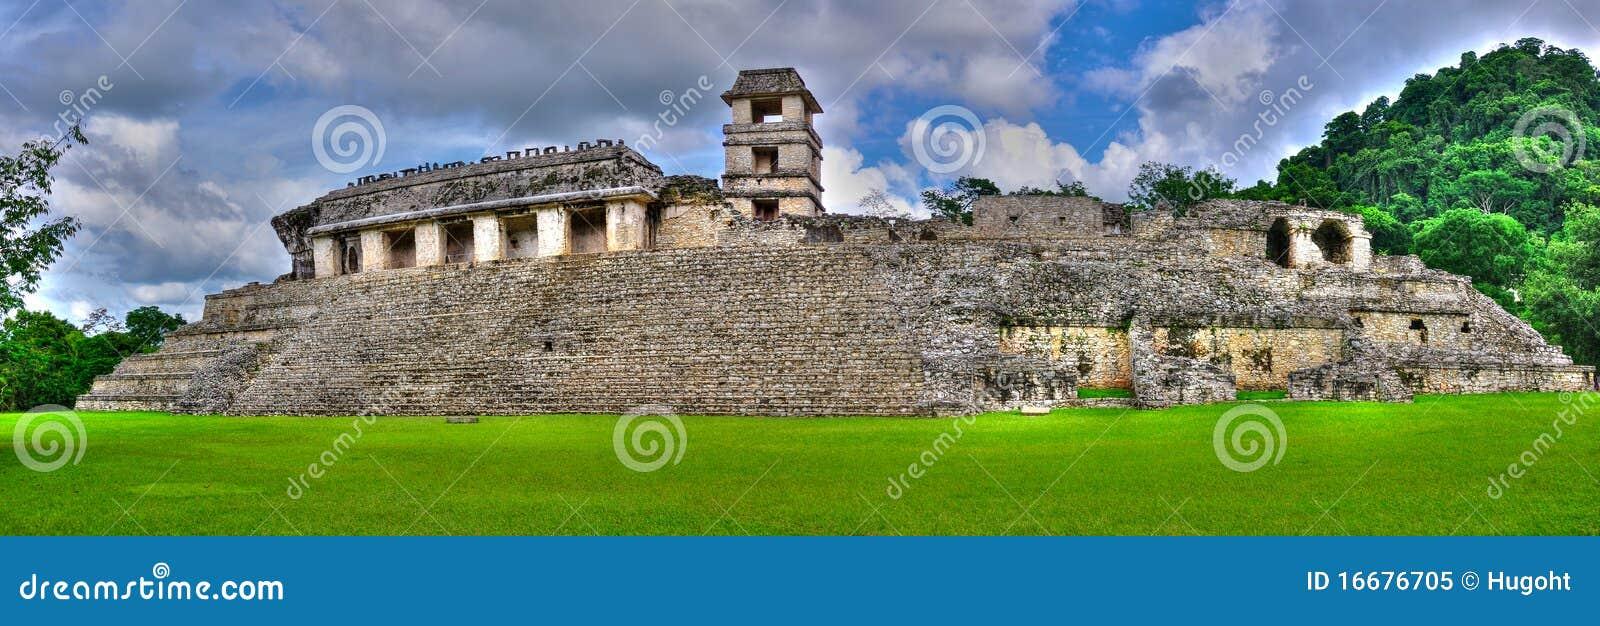 Palenque alte Maya-Tempel, Mexiko